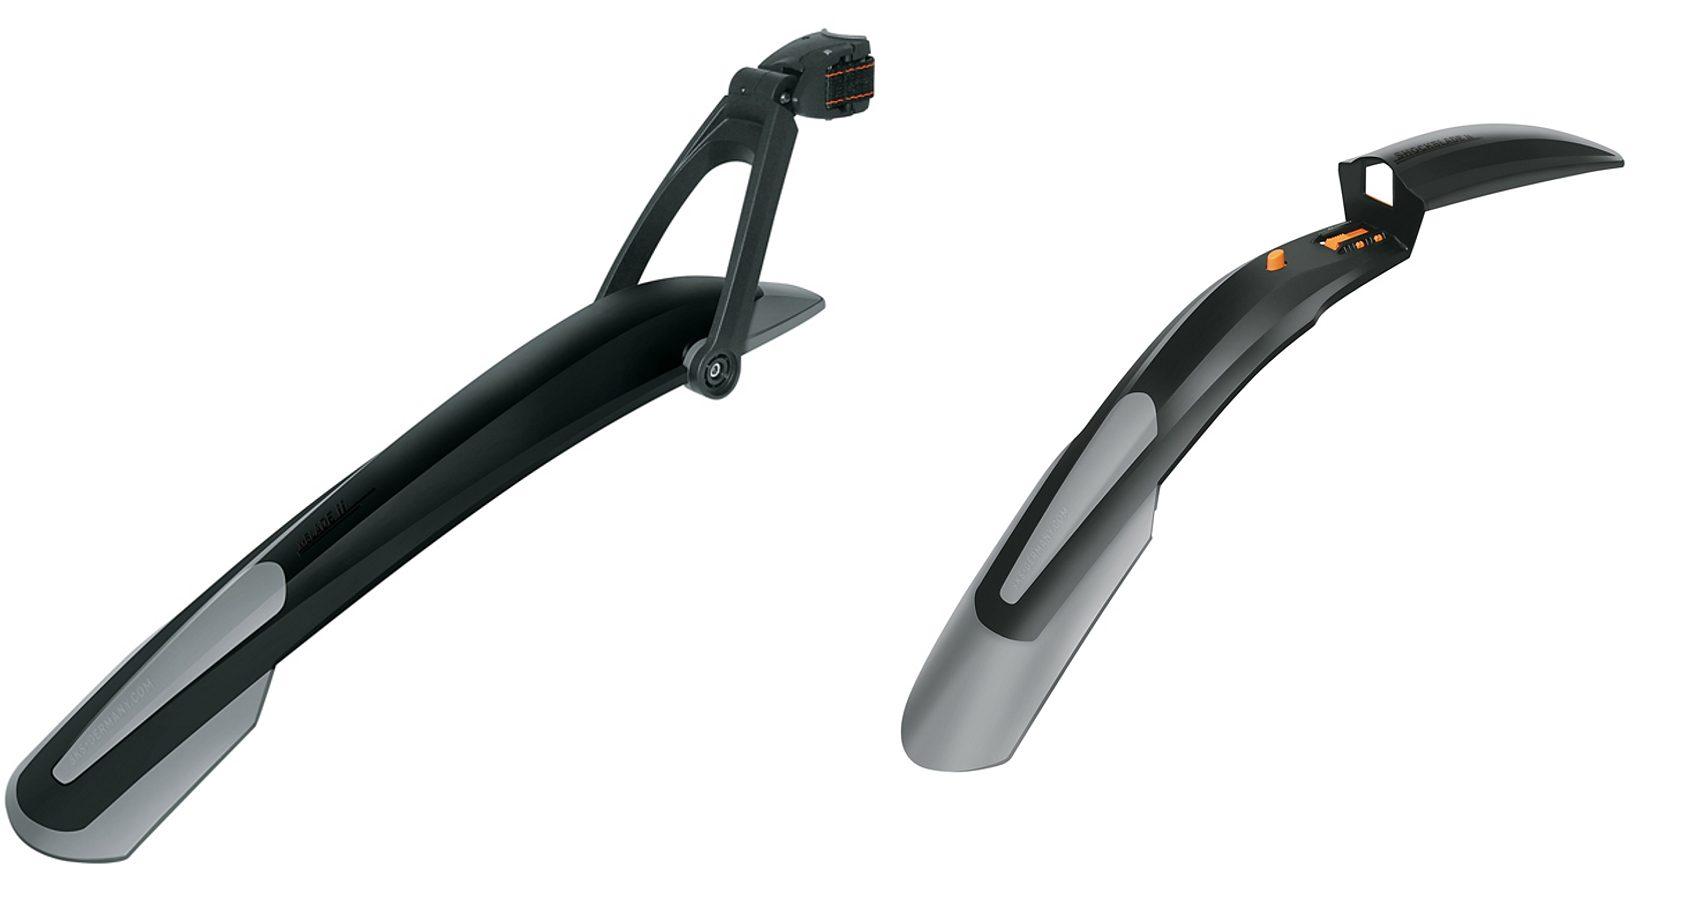 SKS Schutzblech »SKS Shockblade & X-Blade Schutzblechset 26/27.5«